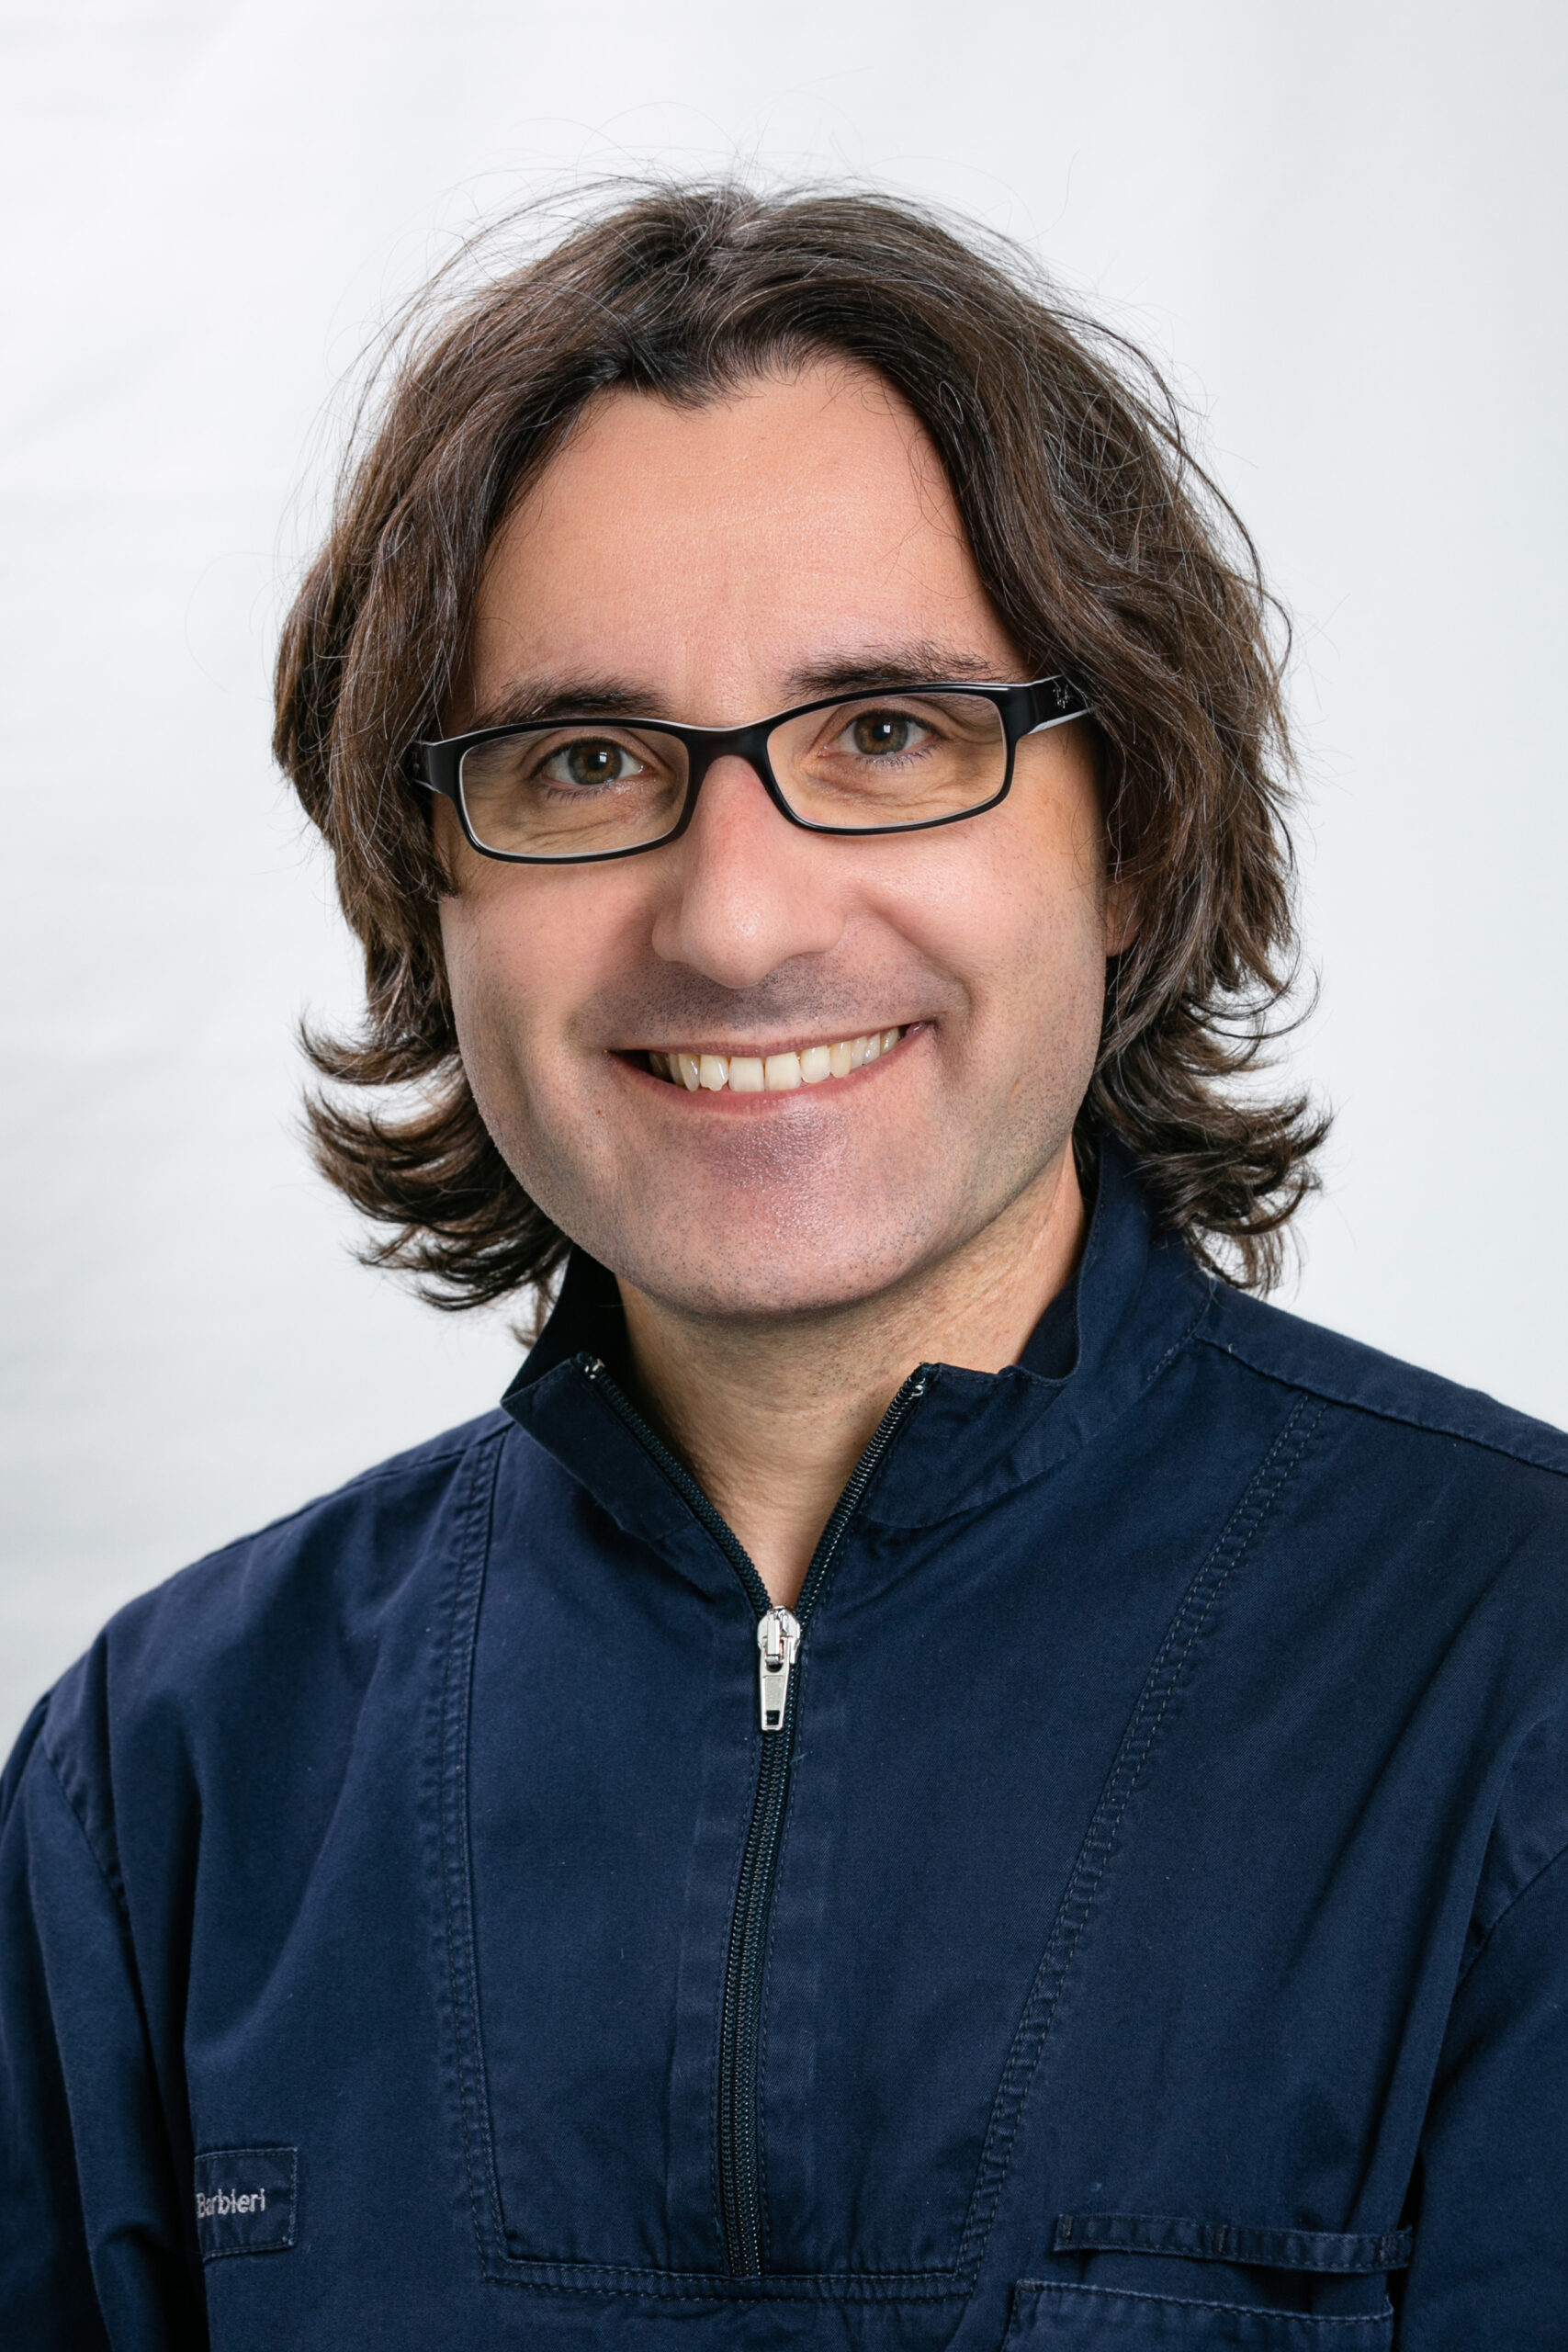 Dott. Christian Barbieri